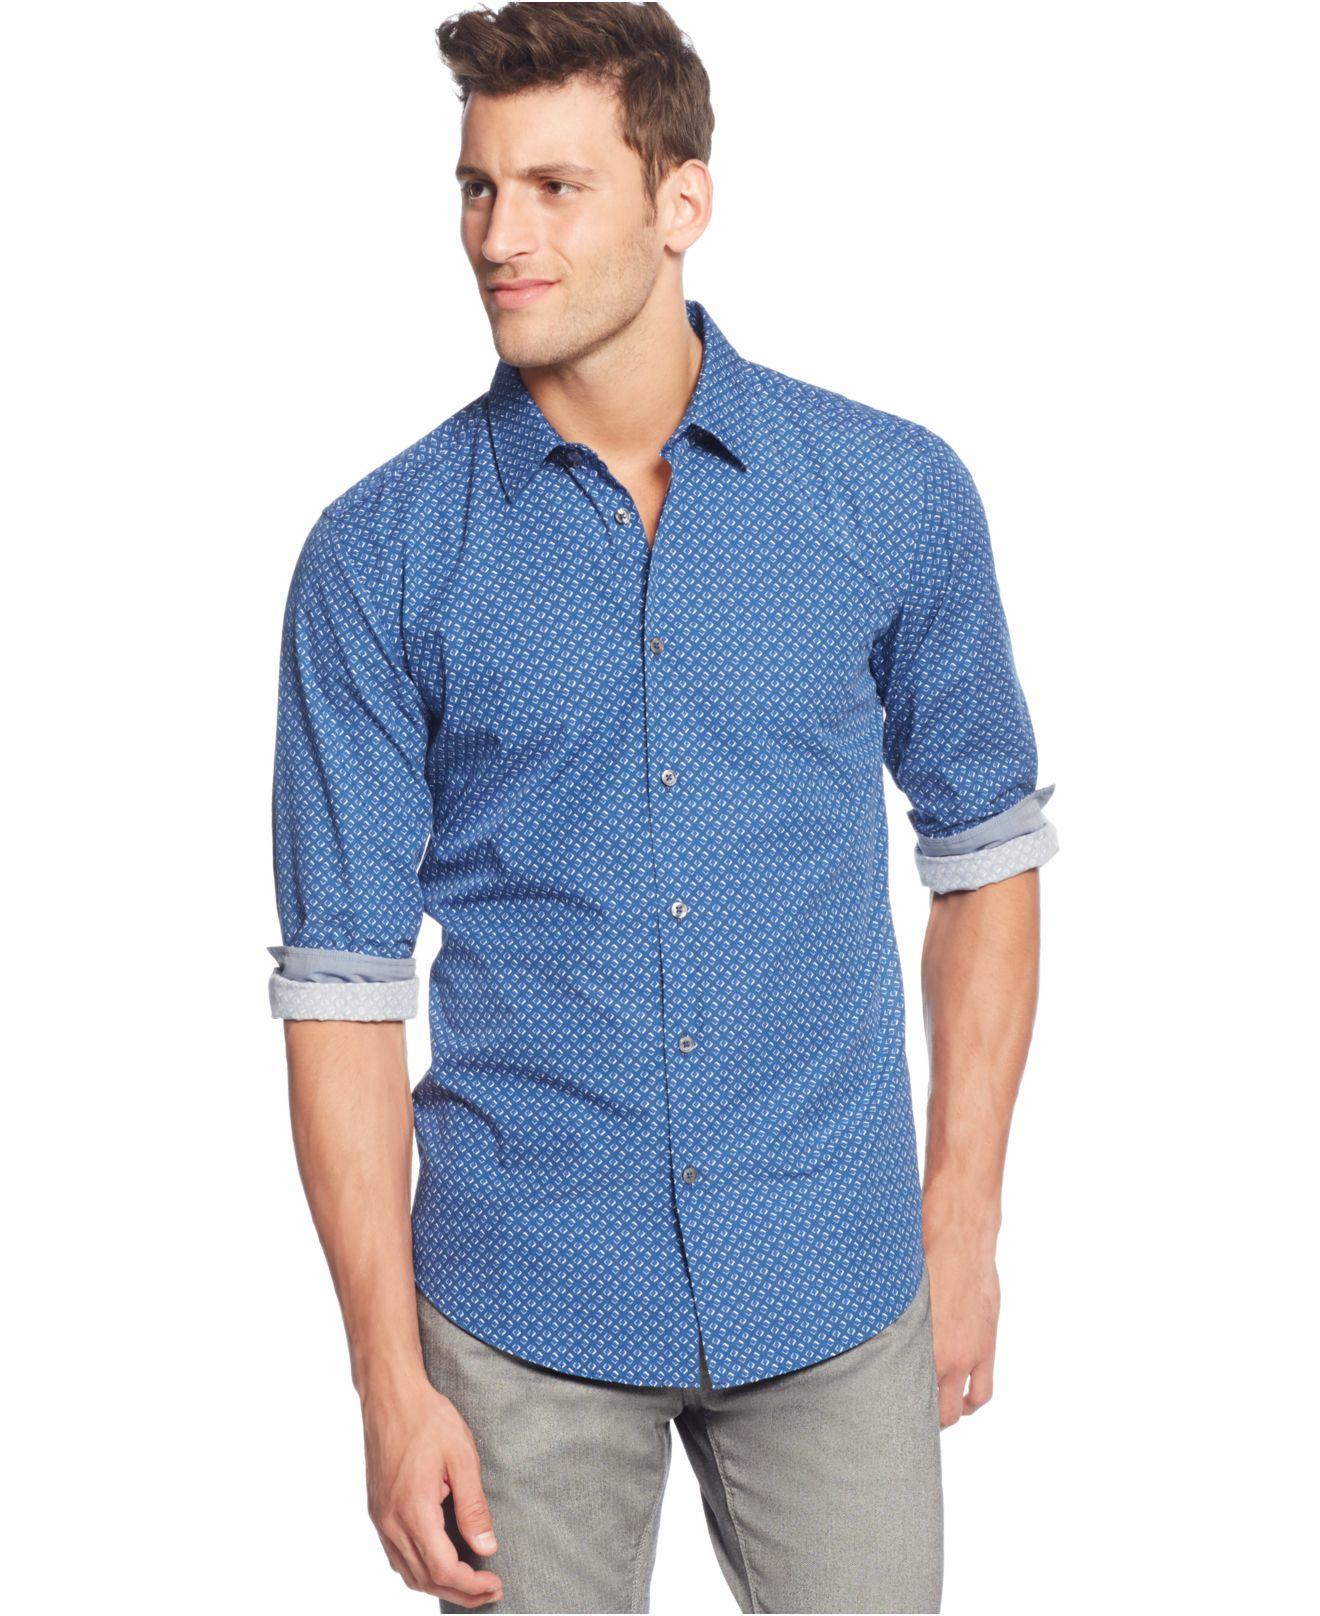 Boss boss slim fit micro print dress shirt in blue for men for Hugo boss formal shirts